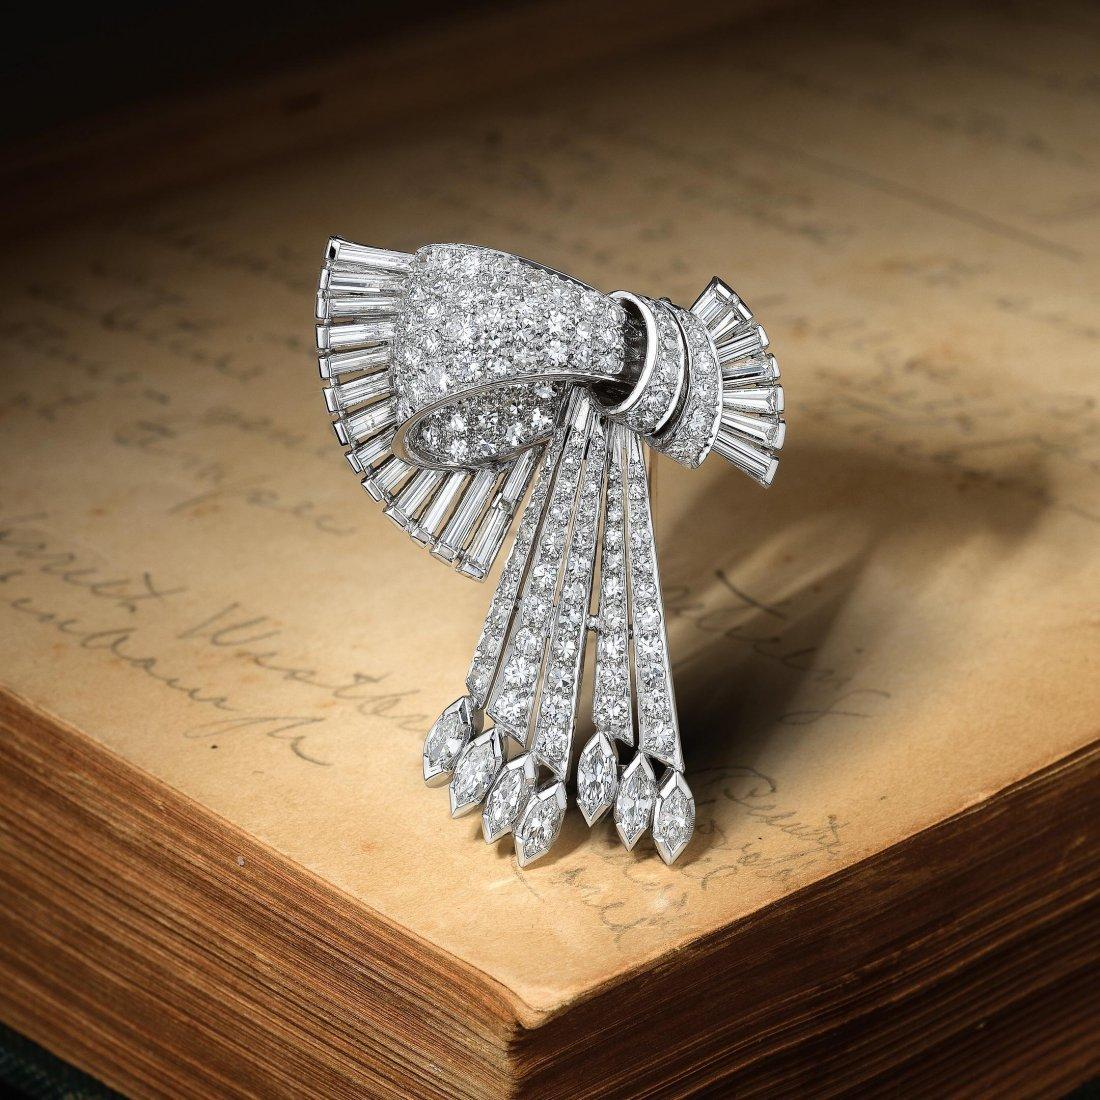 Tiffany & Co. Art Deco Platinum Diamond Brooch